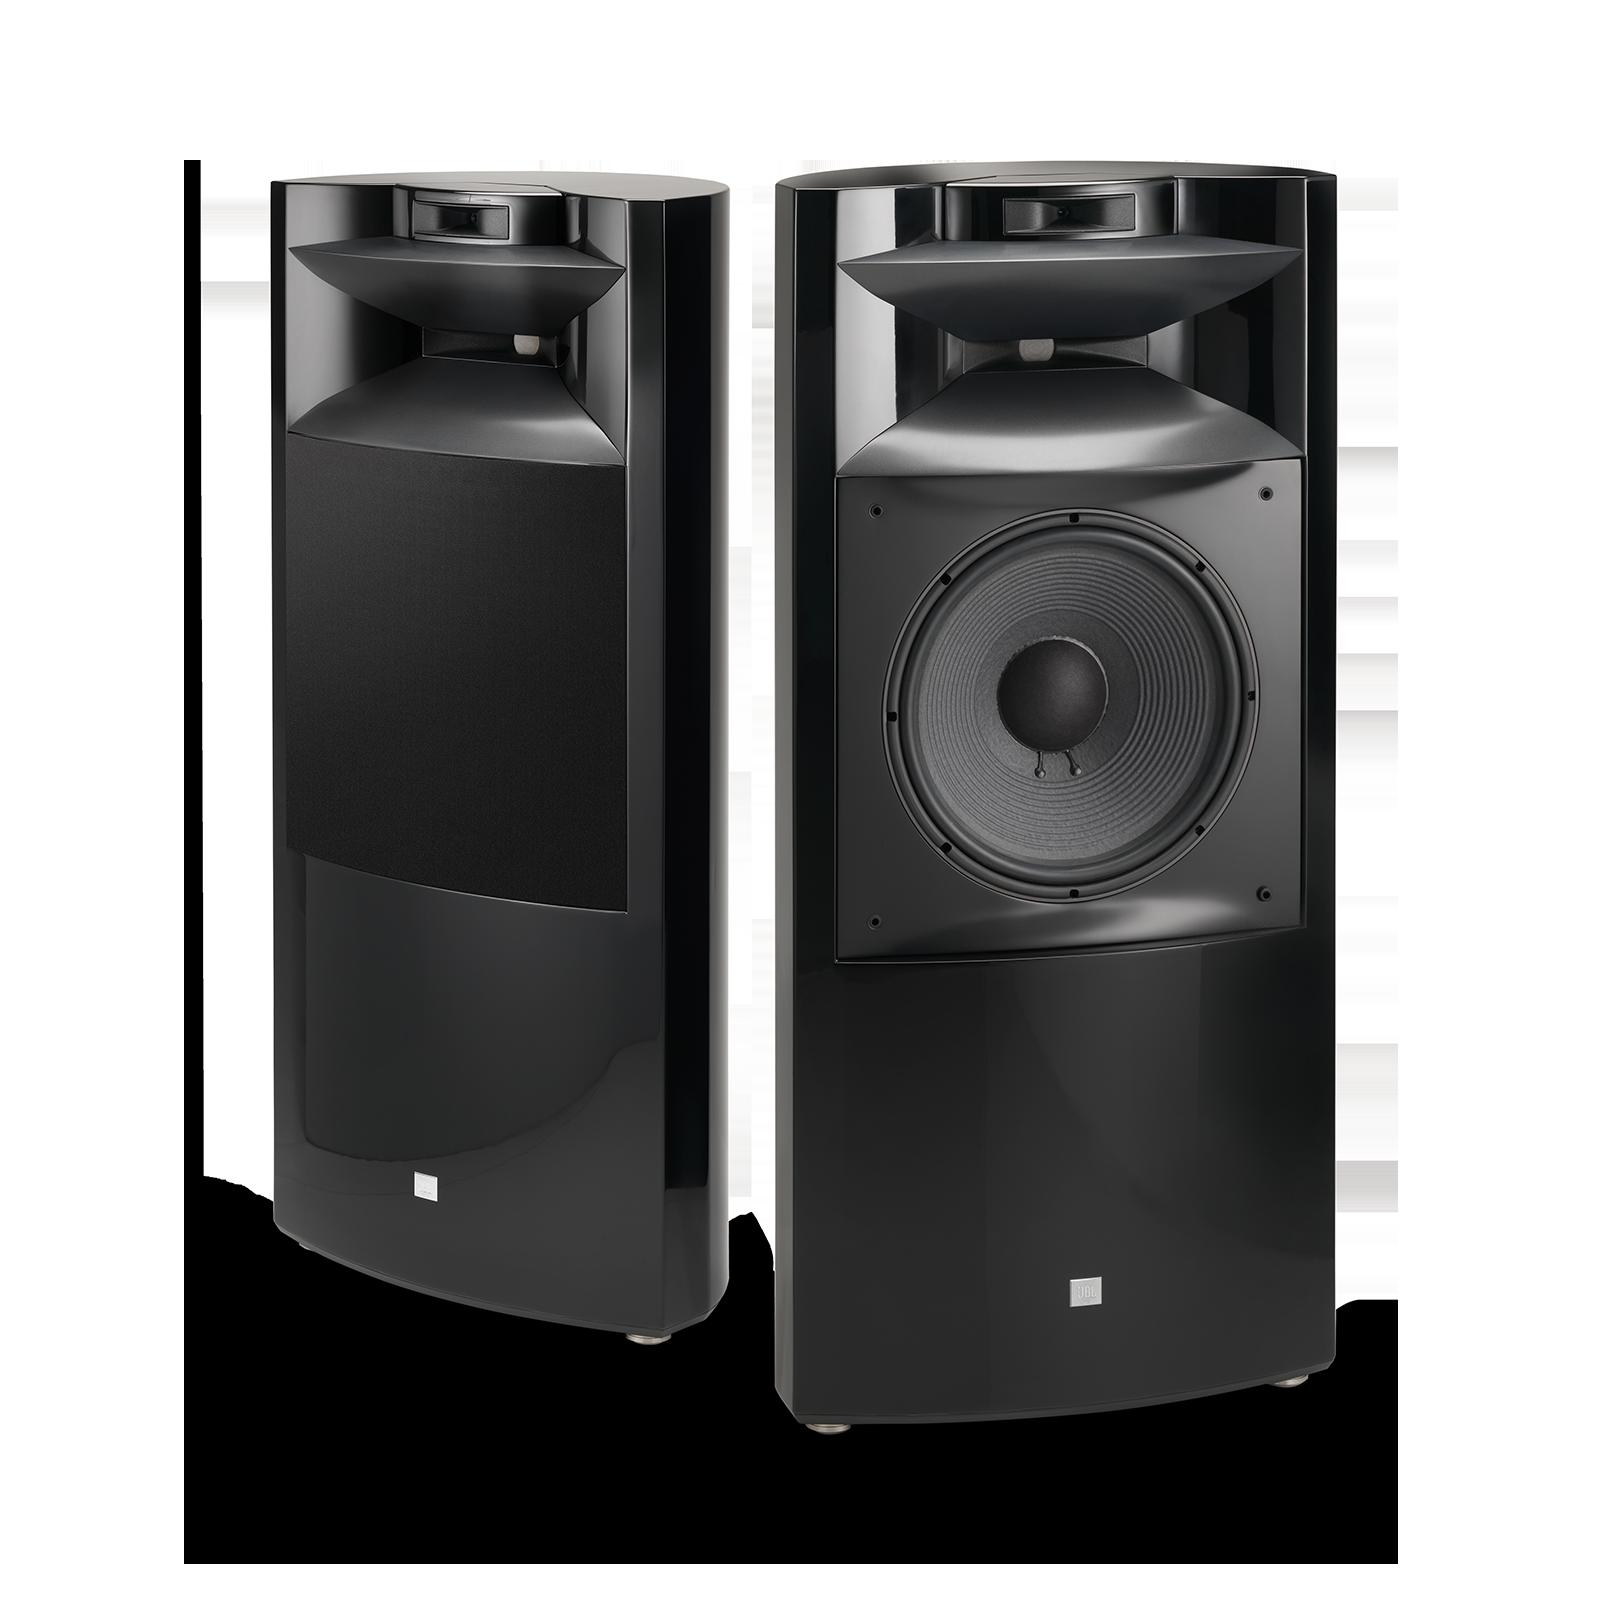 "K2 S9900 - Black Gloss - 3-way 15"" (380mm) Floorstanding Loudspeaker - Hero"